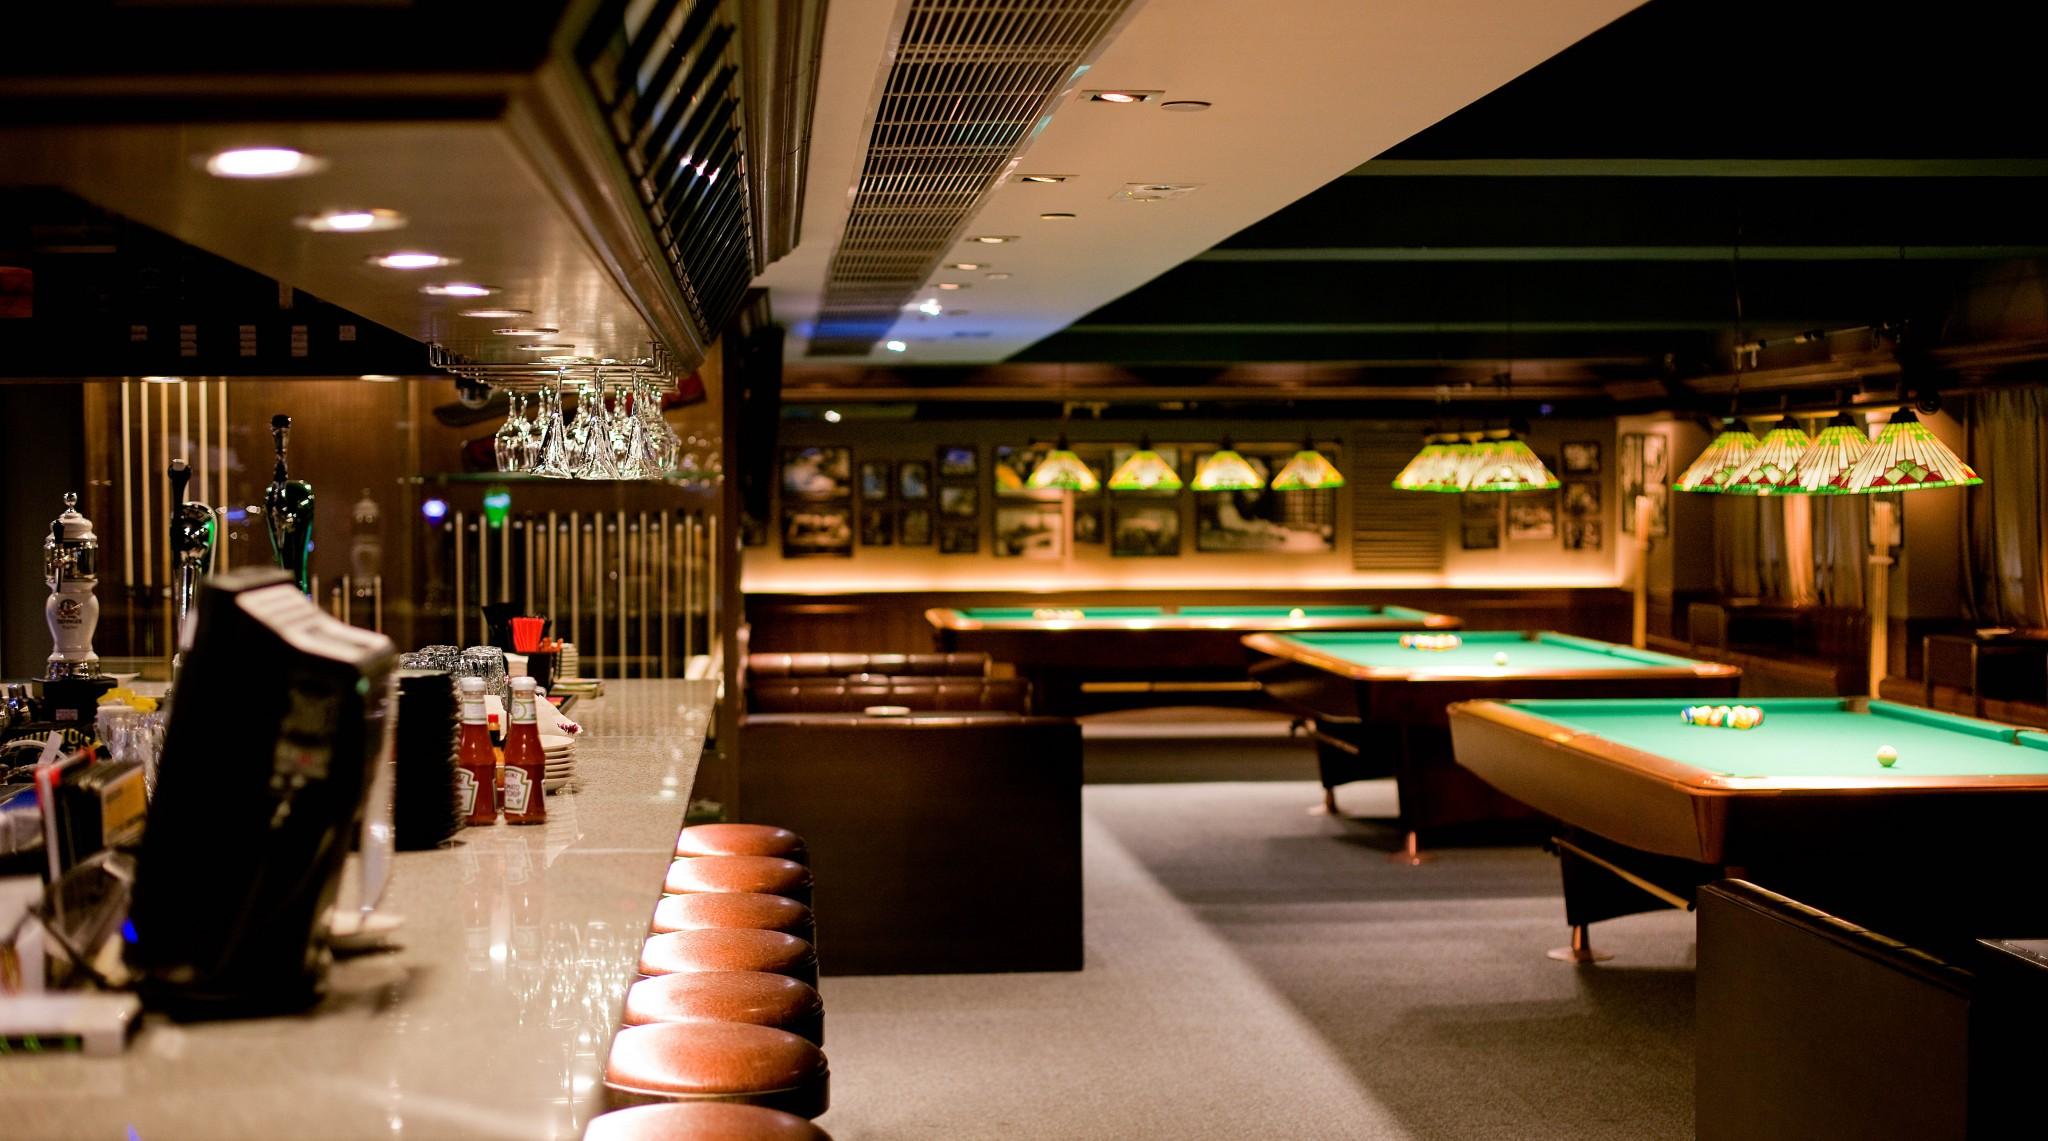 Joe's Billiards & Bar 酒吧 桌球 飛鏢 Beer Pong